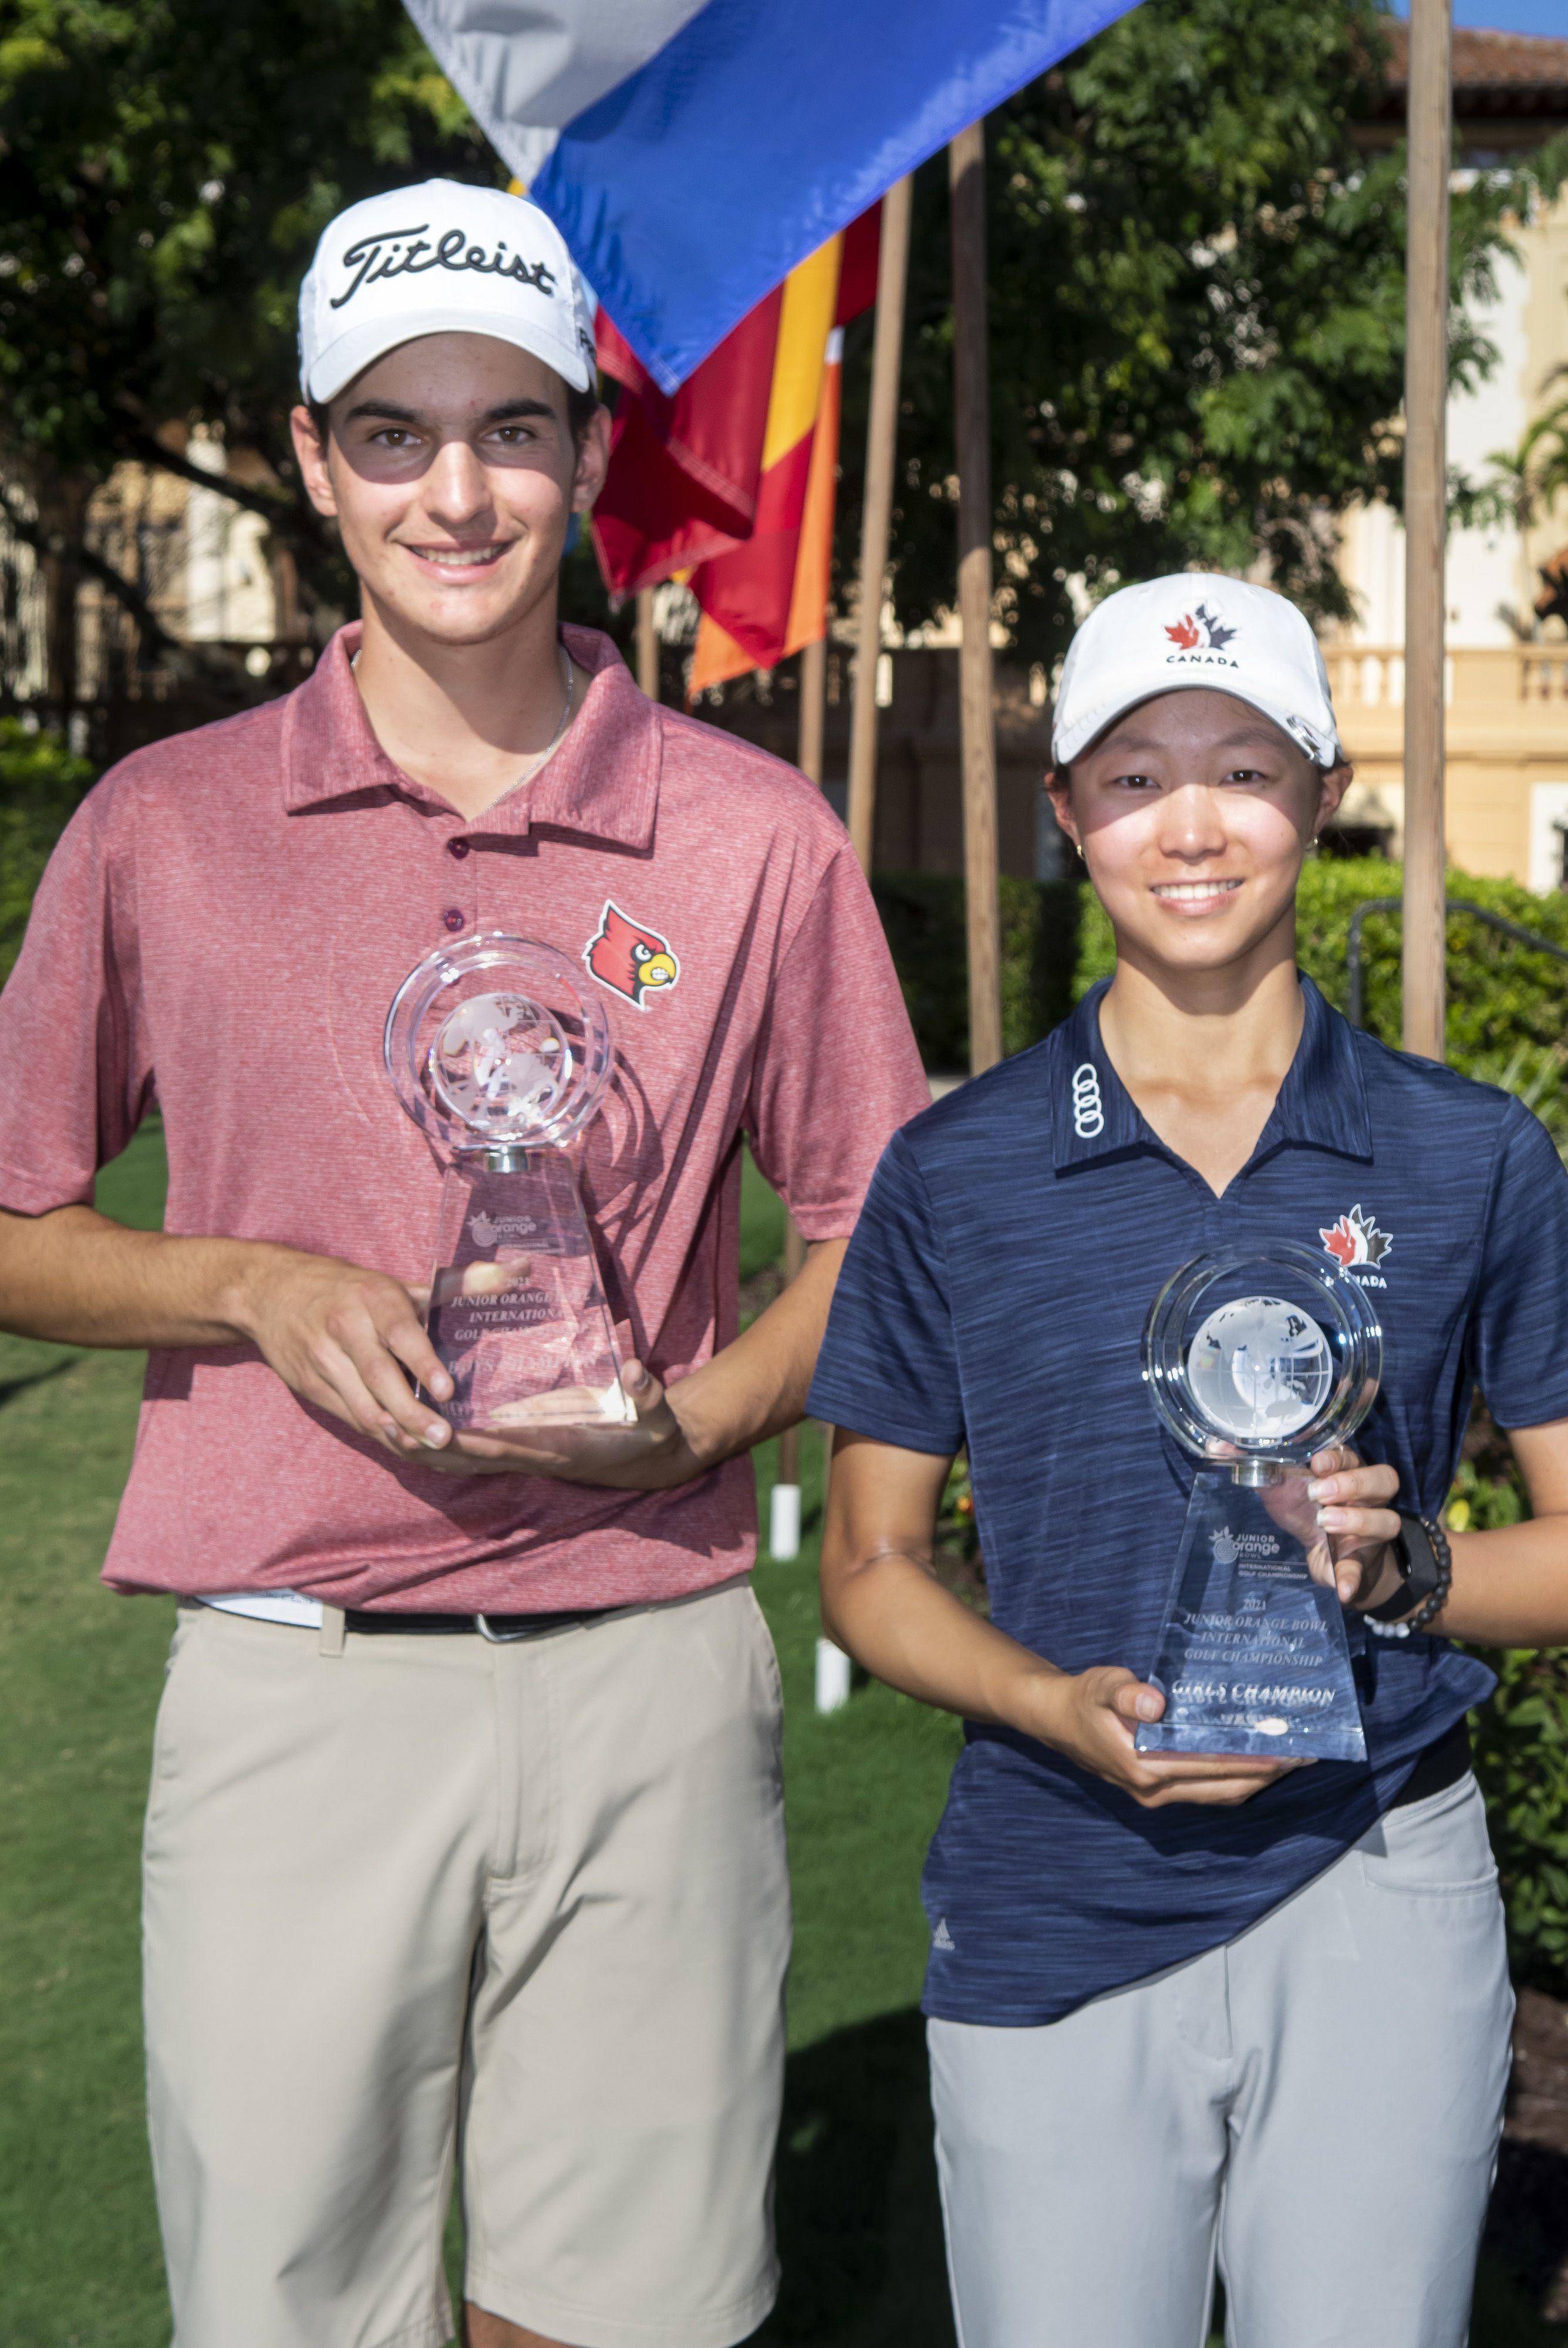 57th Annual Junior Orange Bowl International Golf Championship - Final